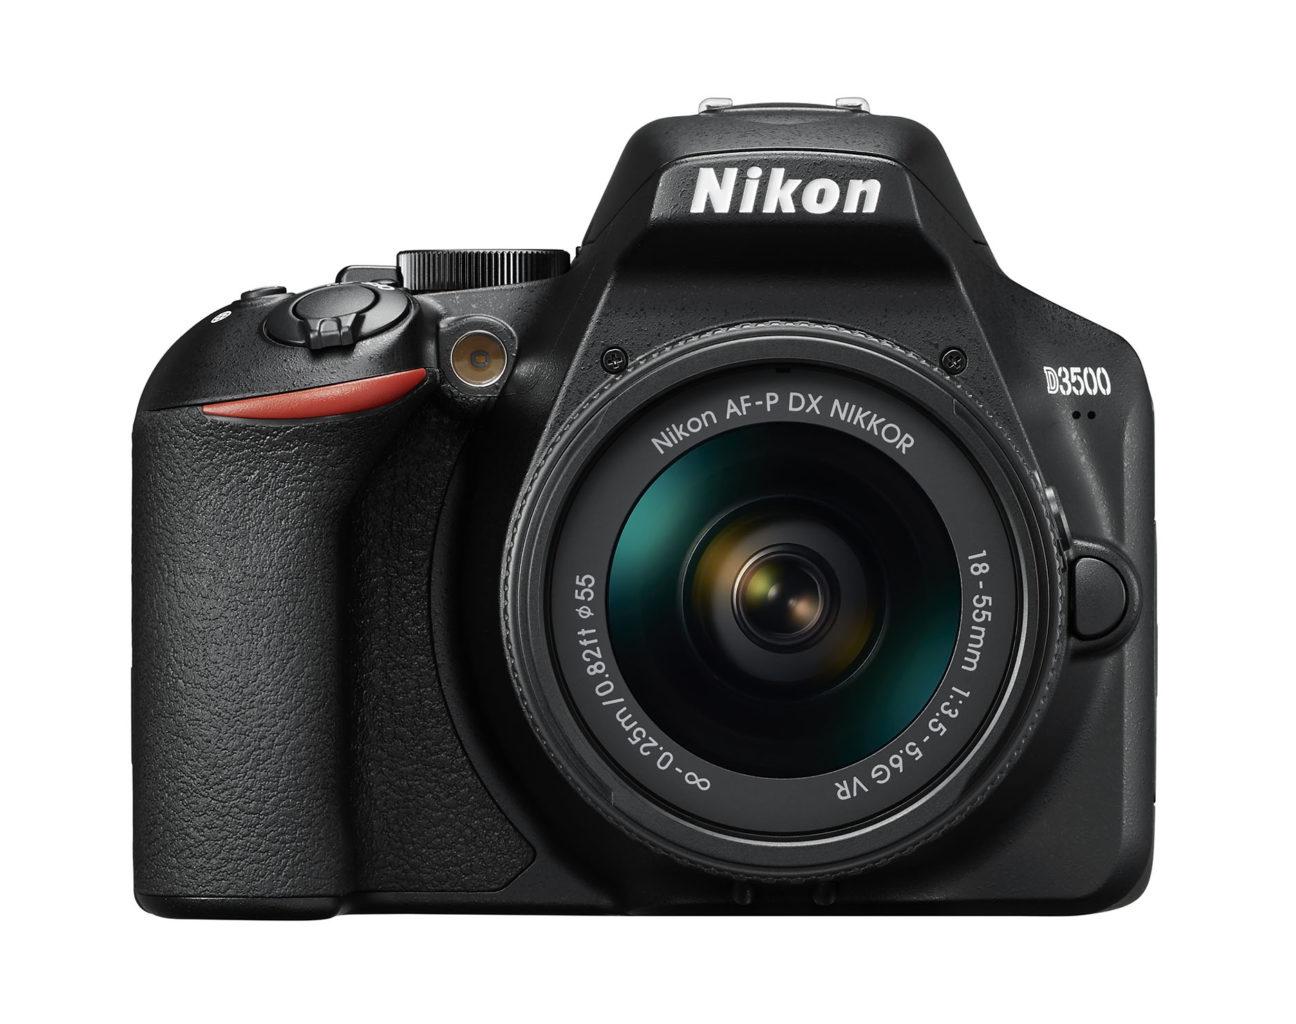 Vorstellung DSLR, Nikon D 3500.